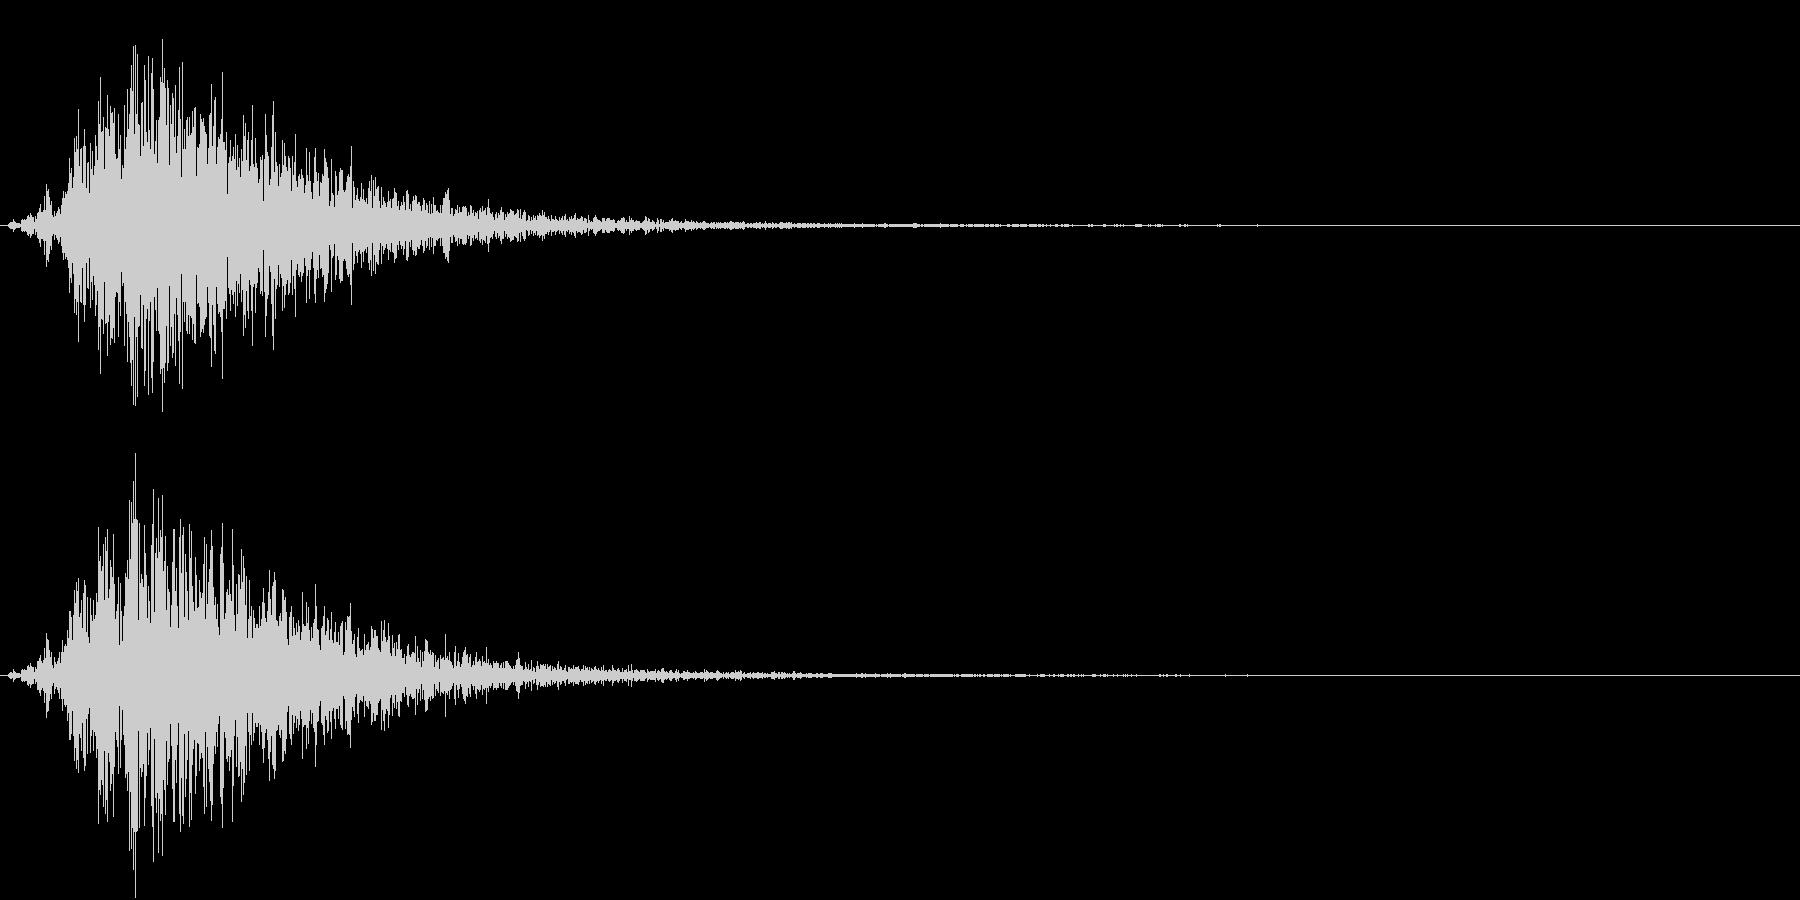 Battle 戦闘エフェクト音 3の未再生の波形